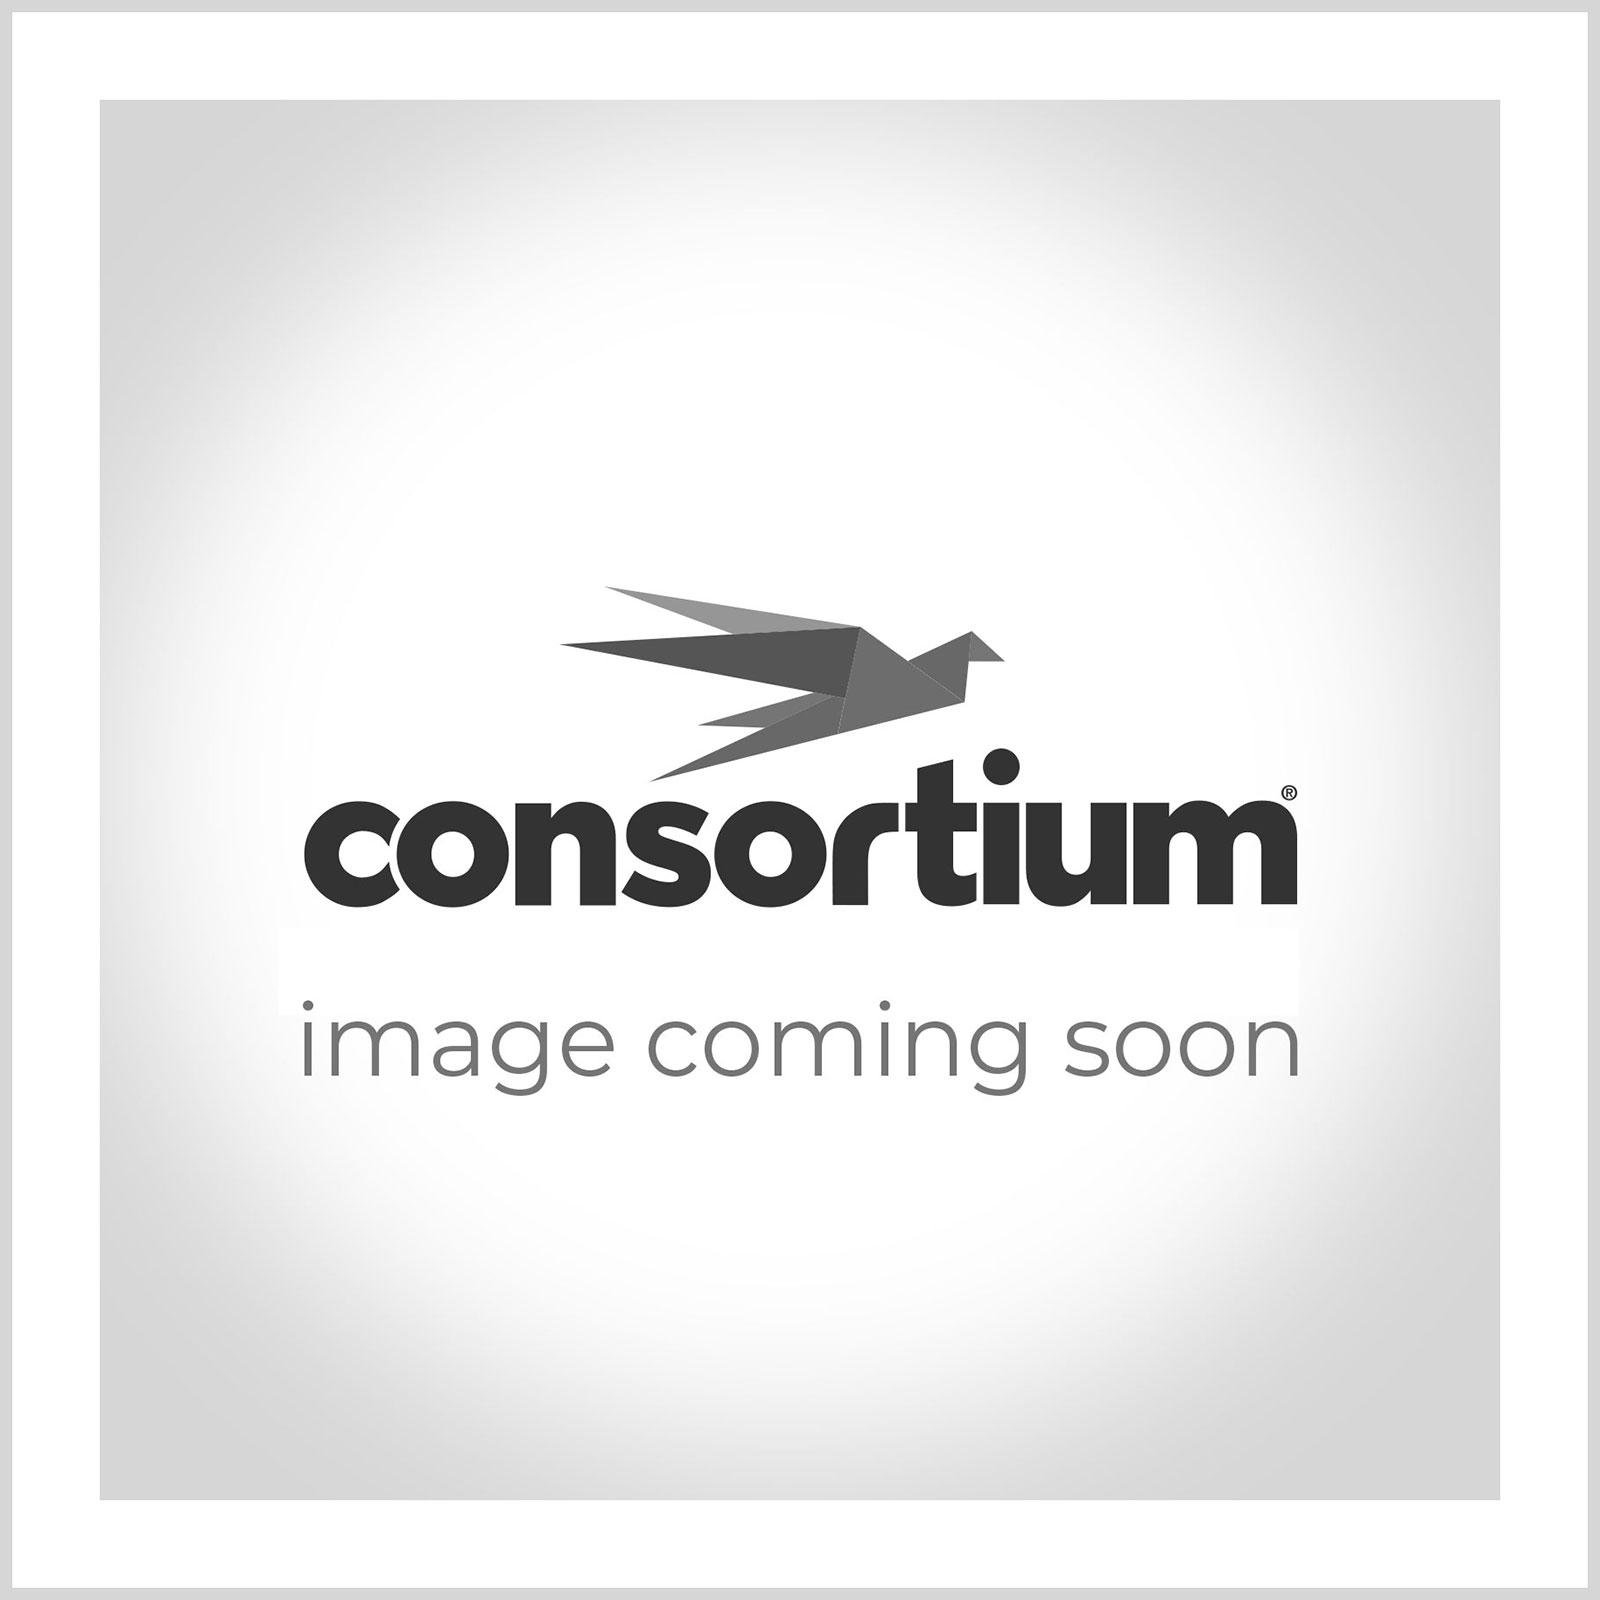 V Board Master Whiteboard Markers Classpack